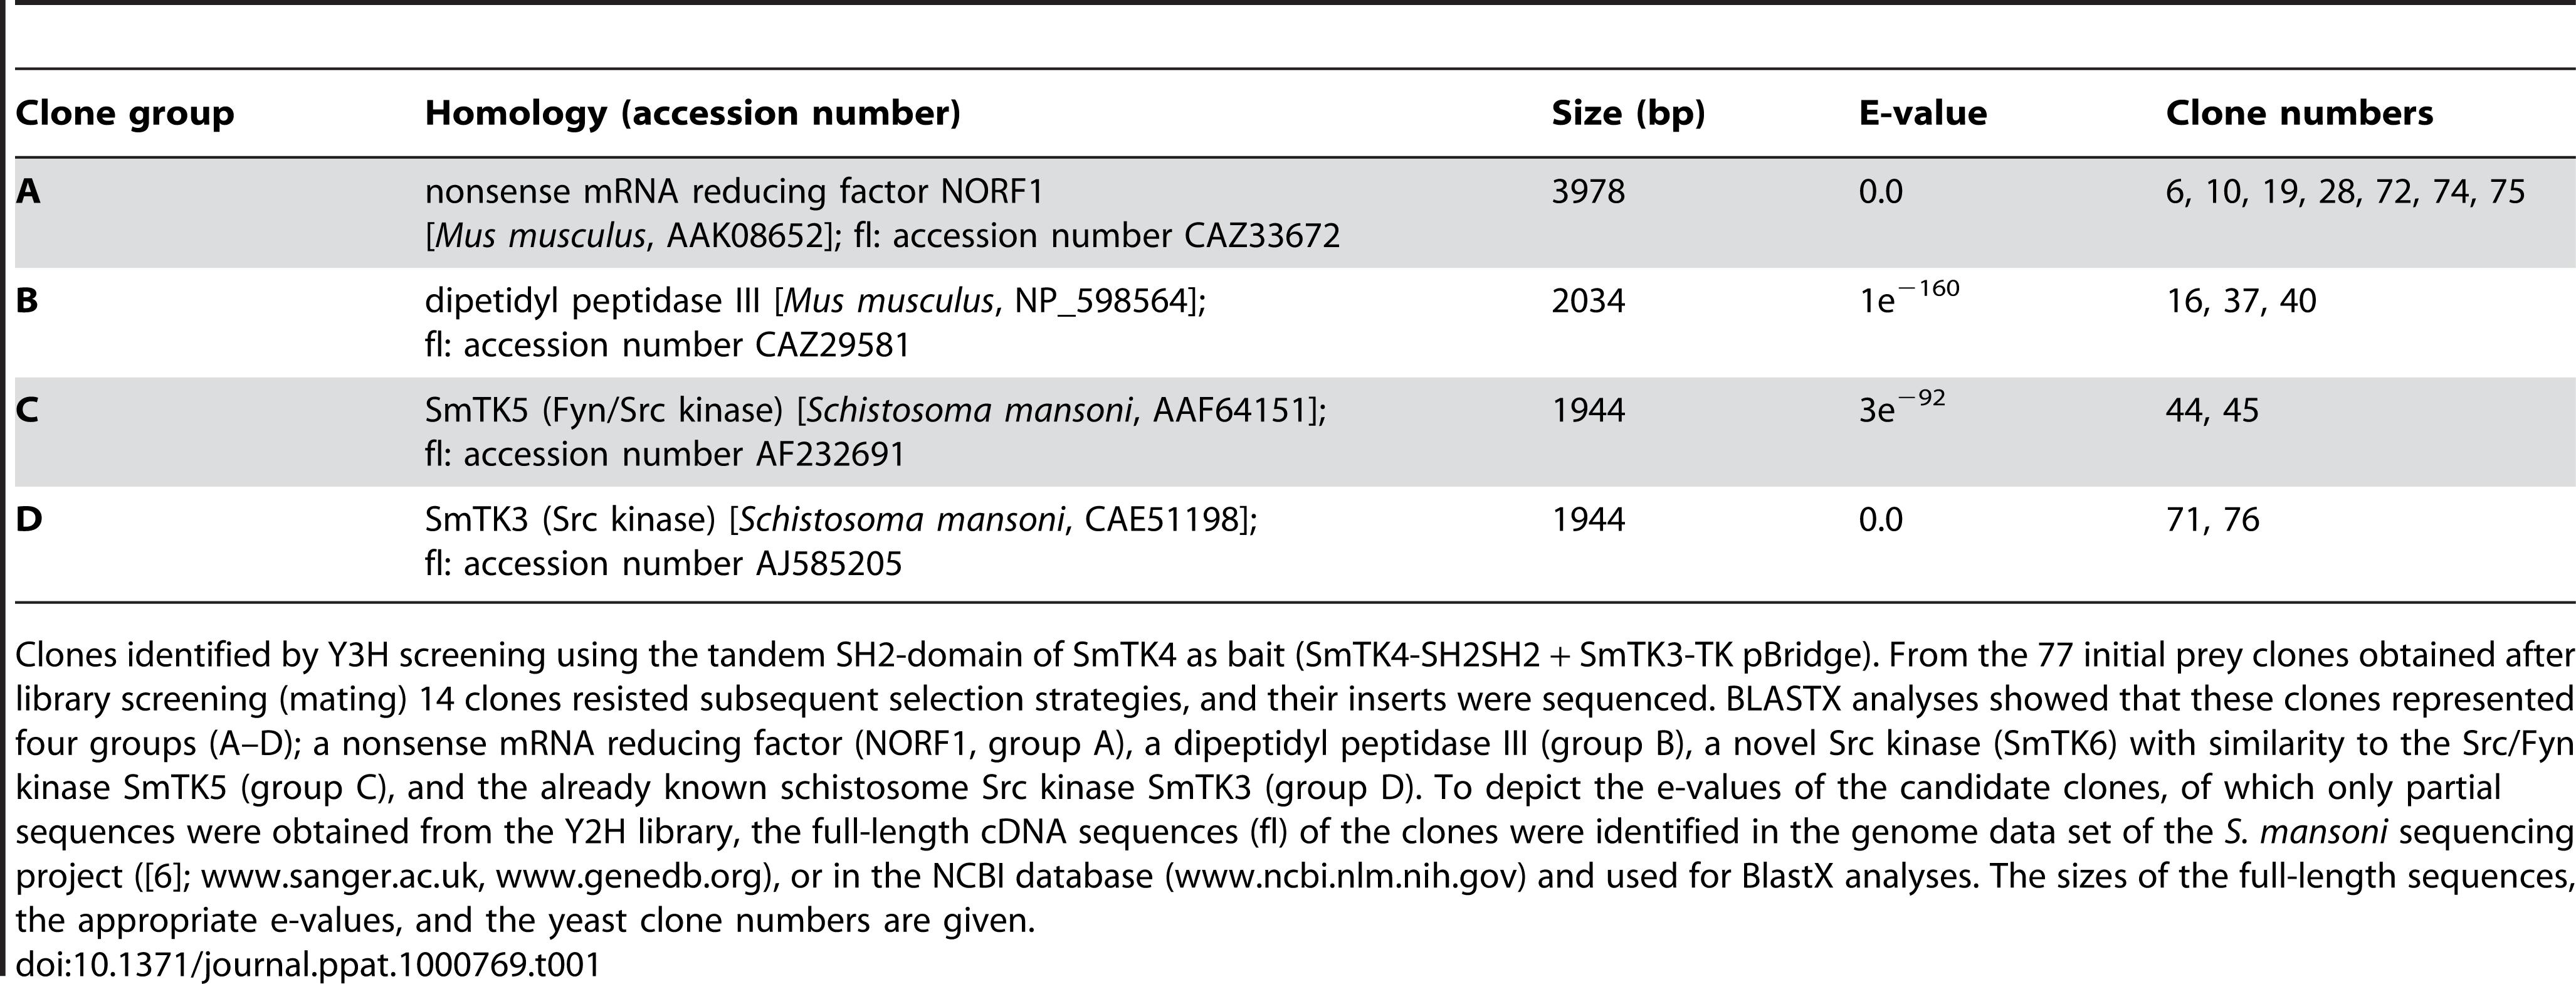 Identified upstream binding partners of SmTK4.